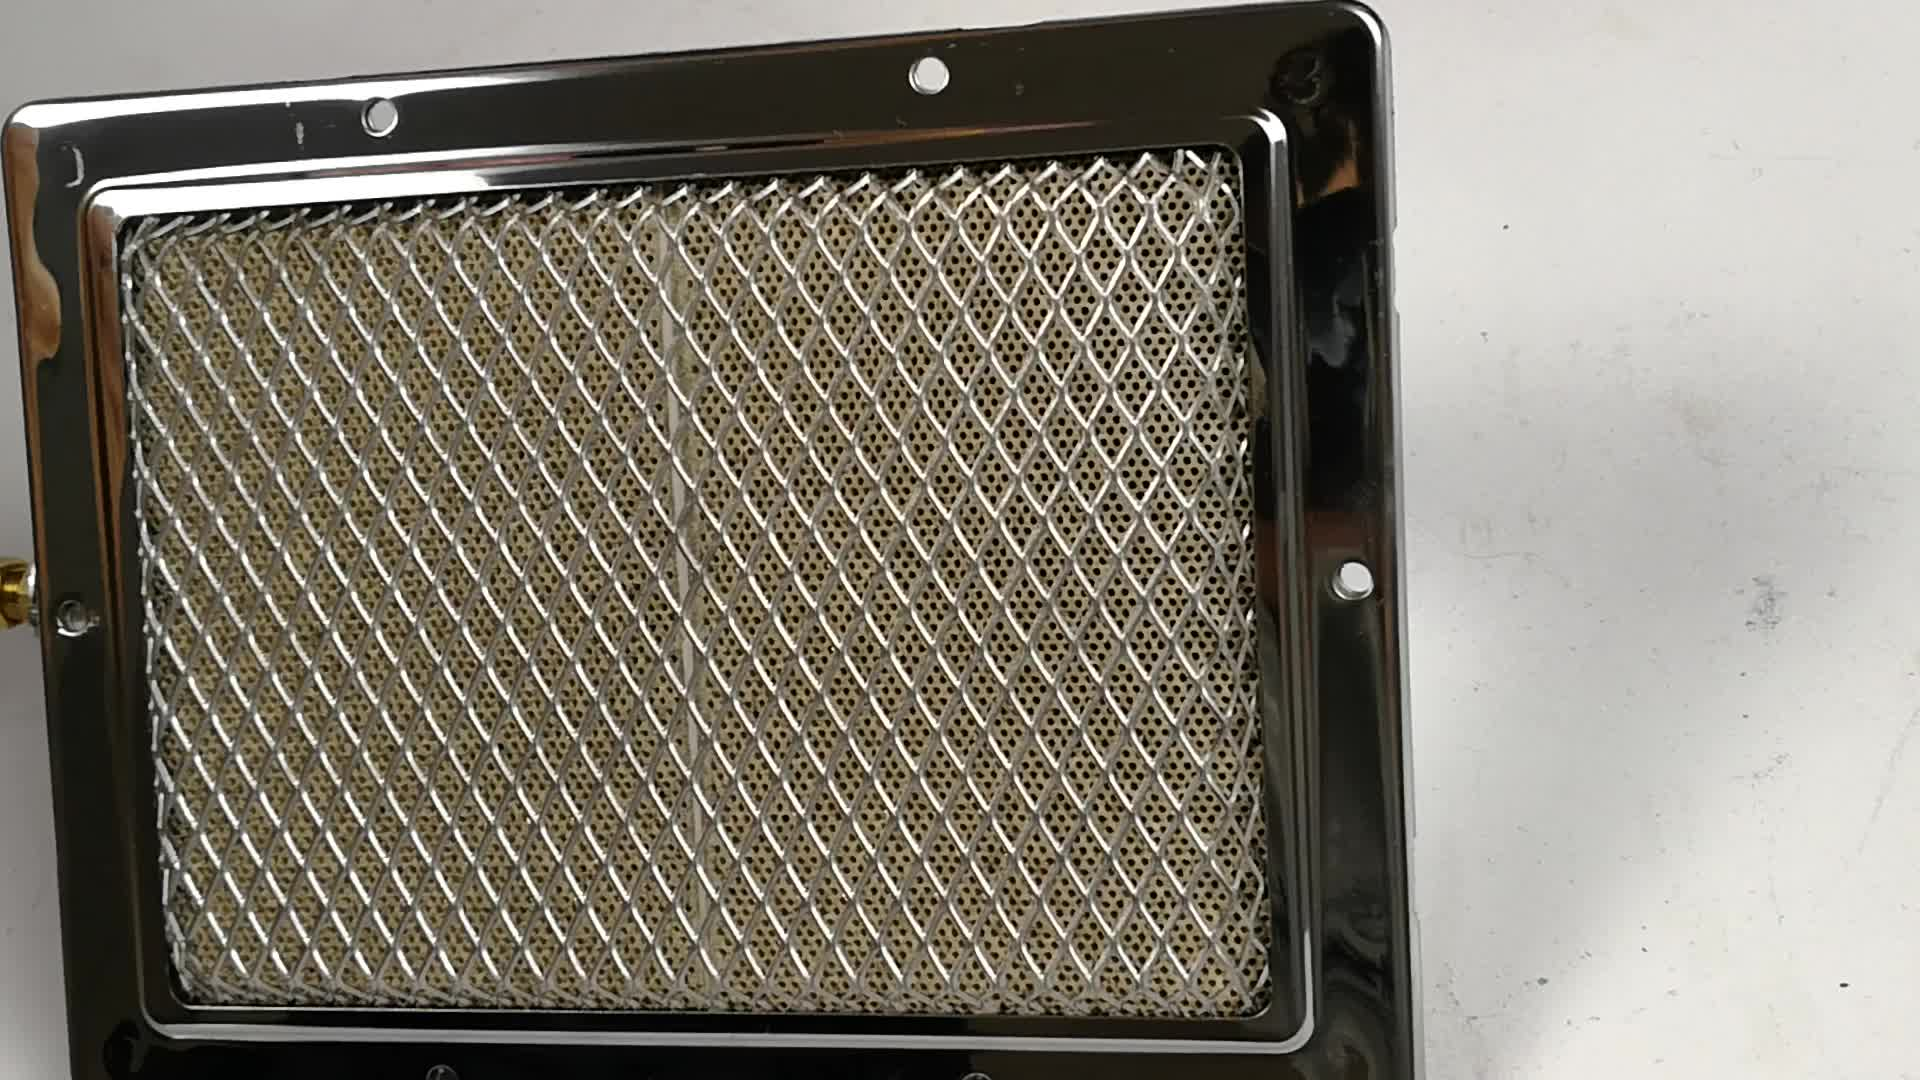 Hot sale Infrared Ceramic Camping BBQ Gas Stove Burner HD220